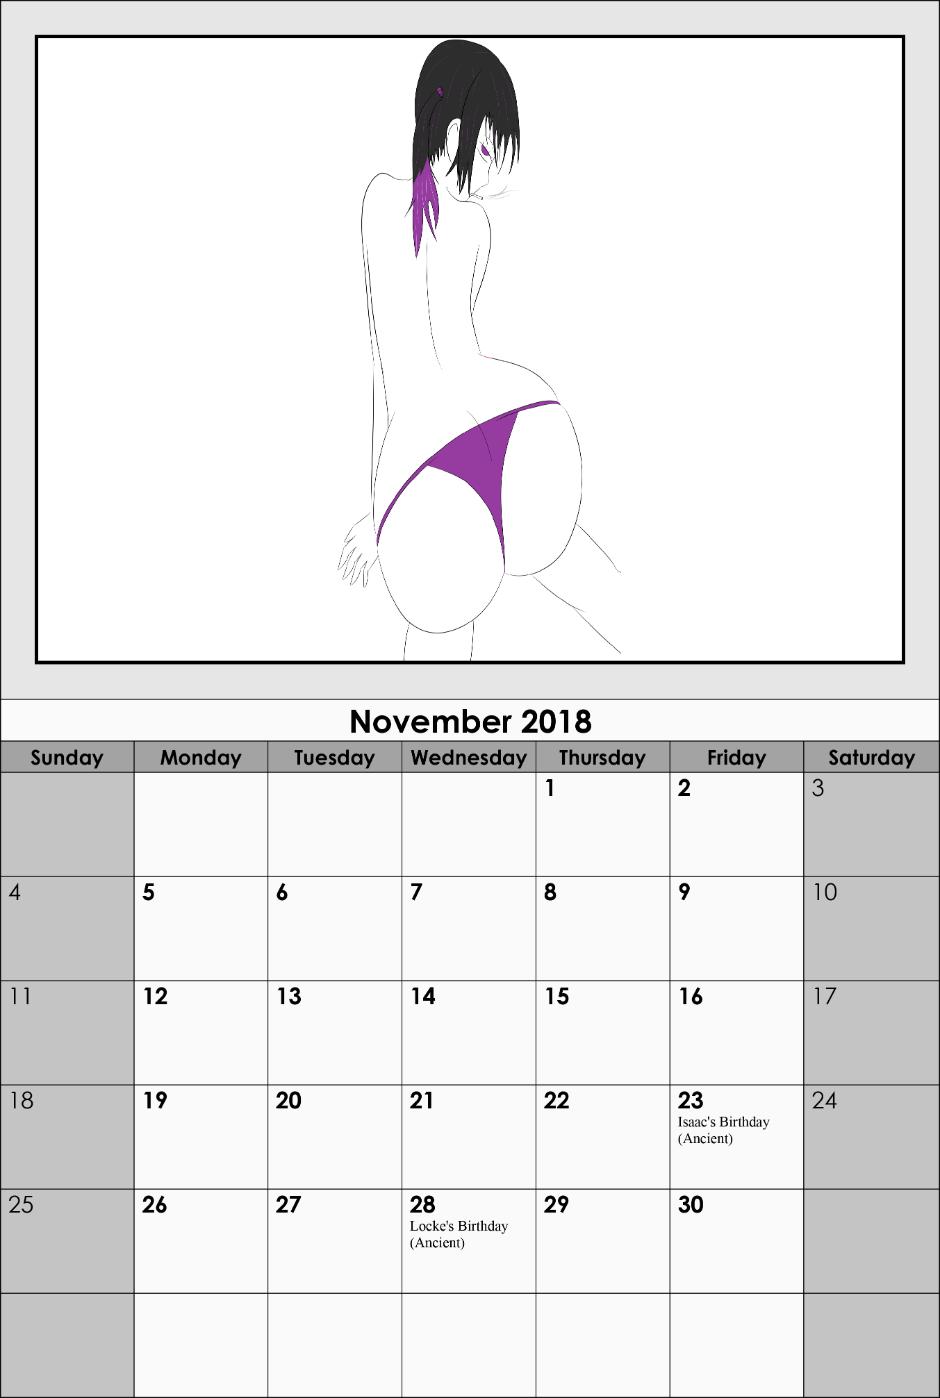 Rulerbrain - November